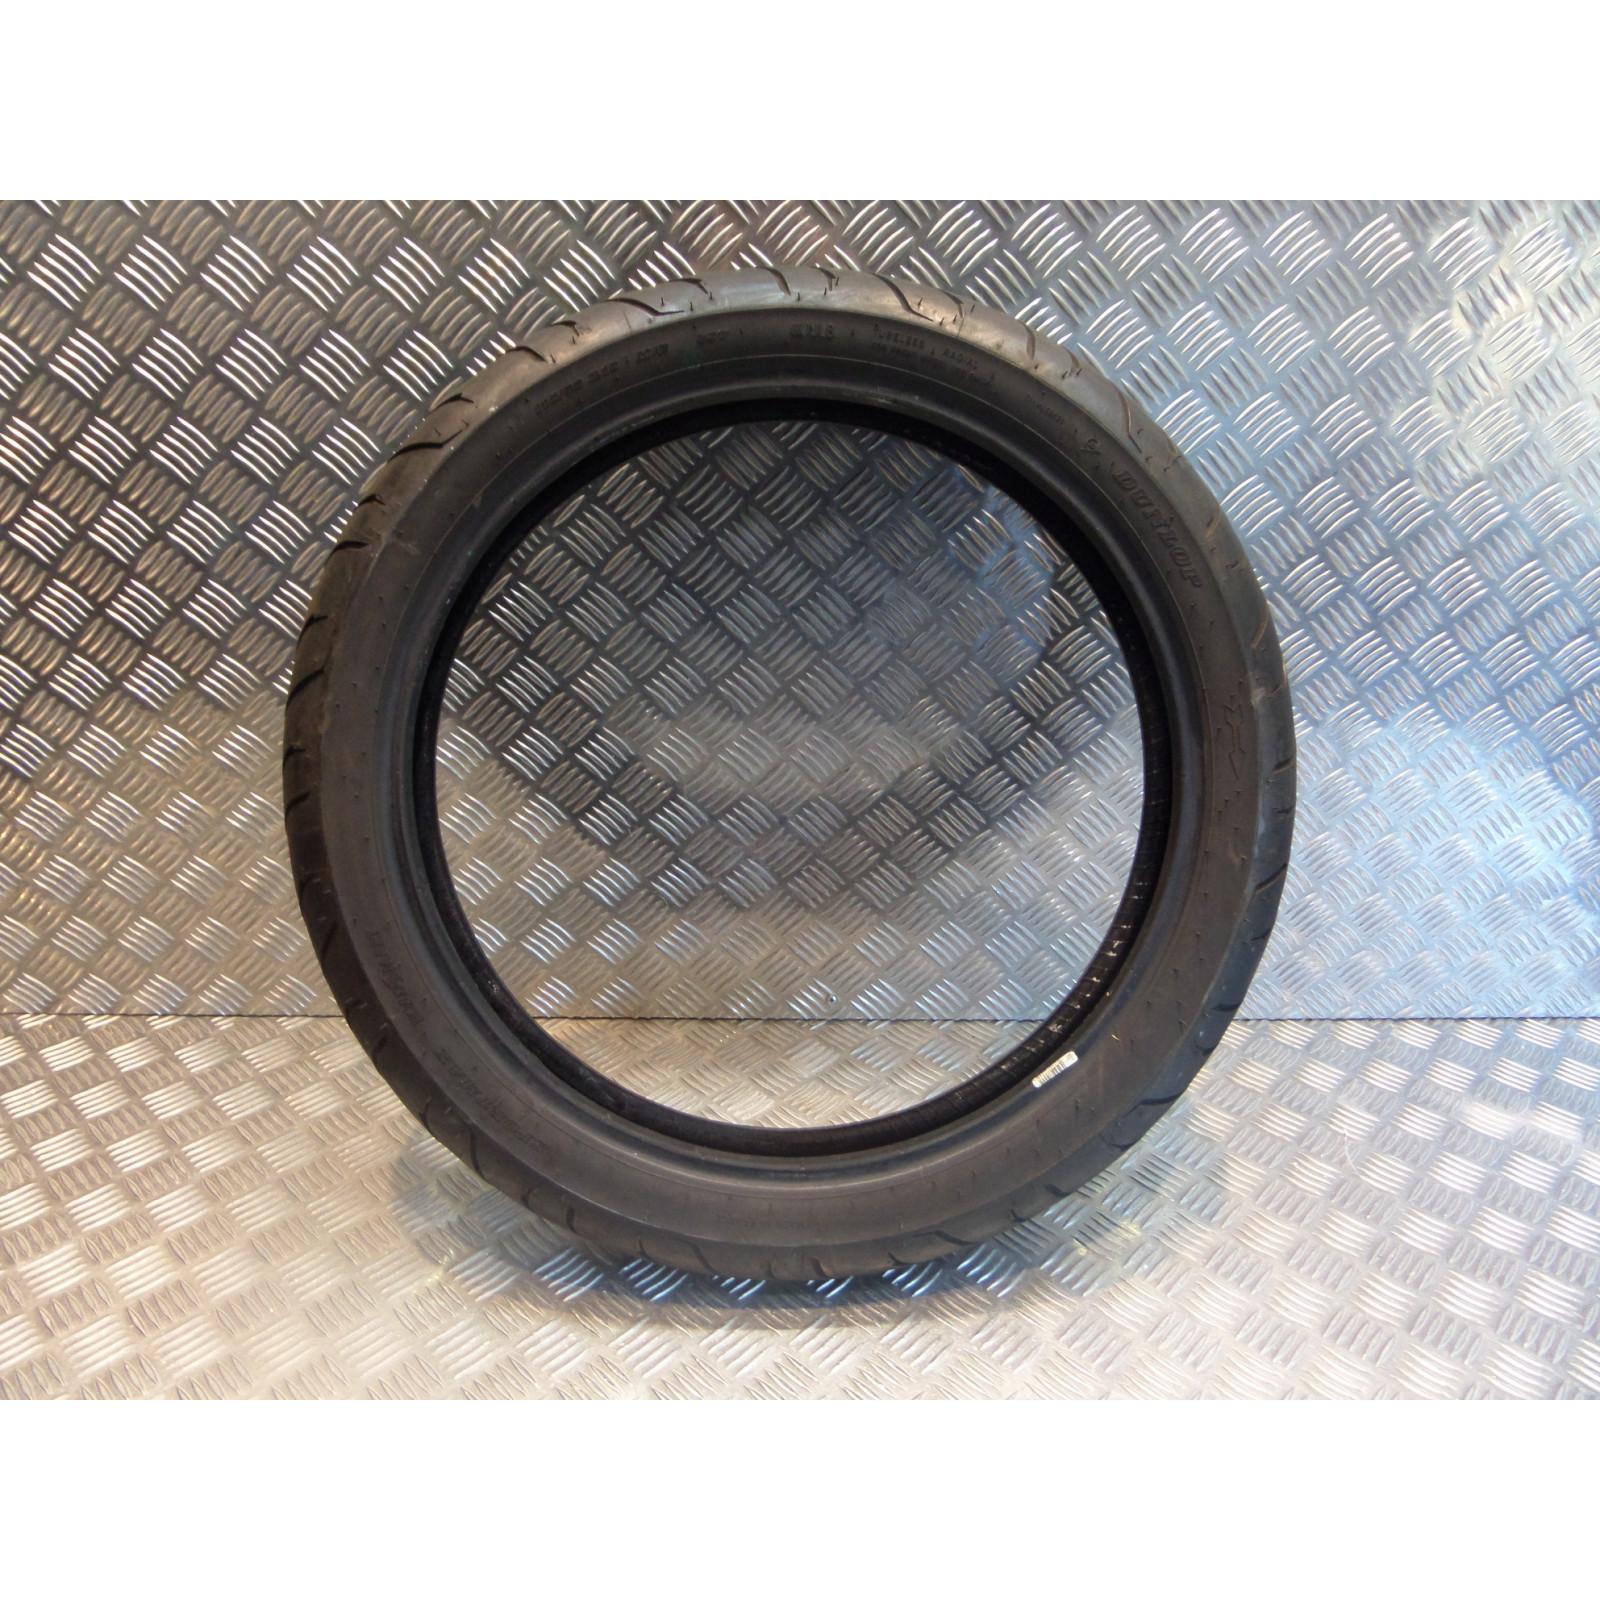 pneu moto dunlop sportmax roadsmart 110 / 80 r 19 m/c 59v occasion